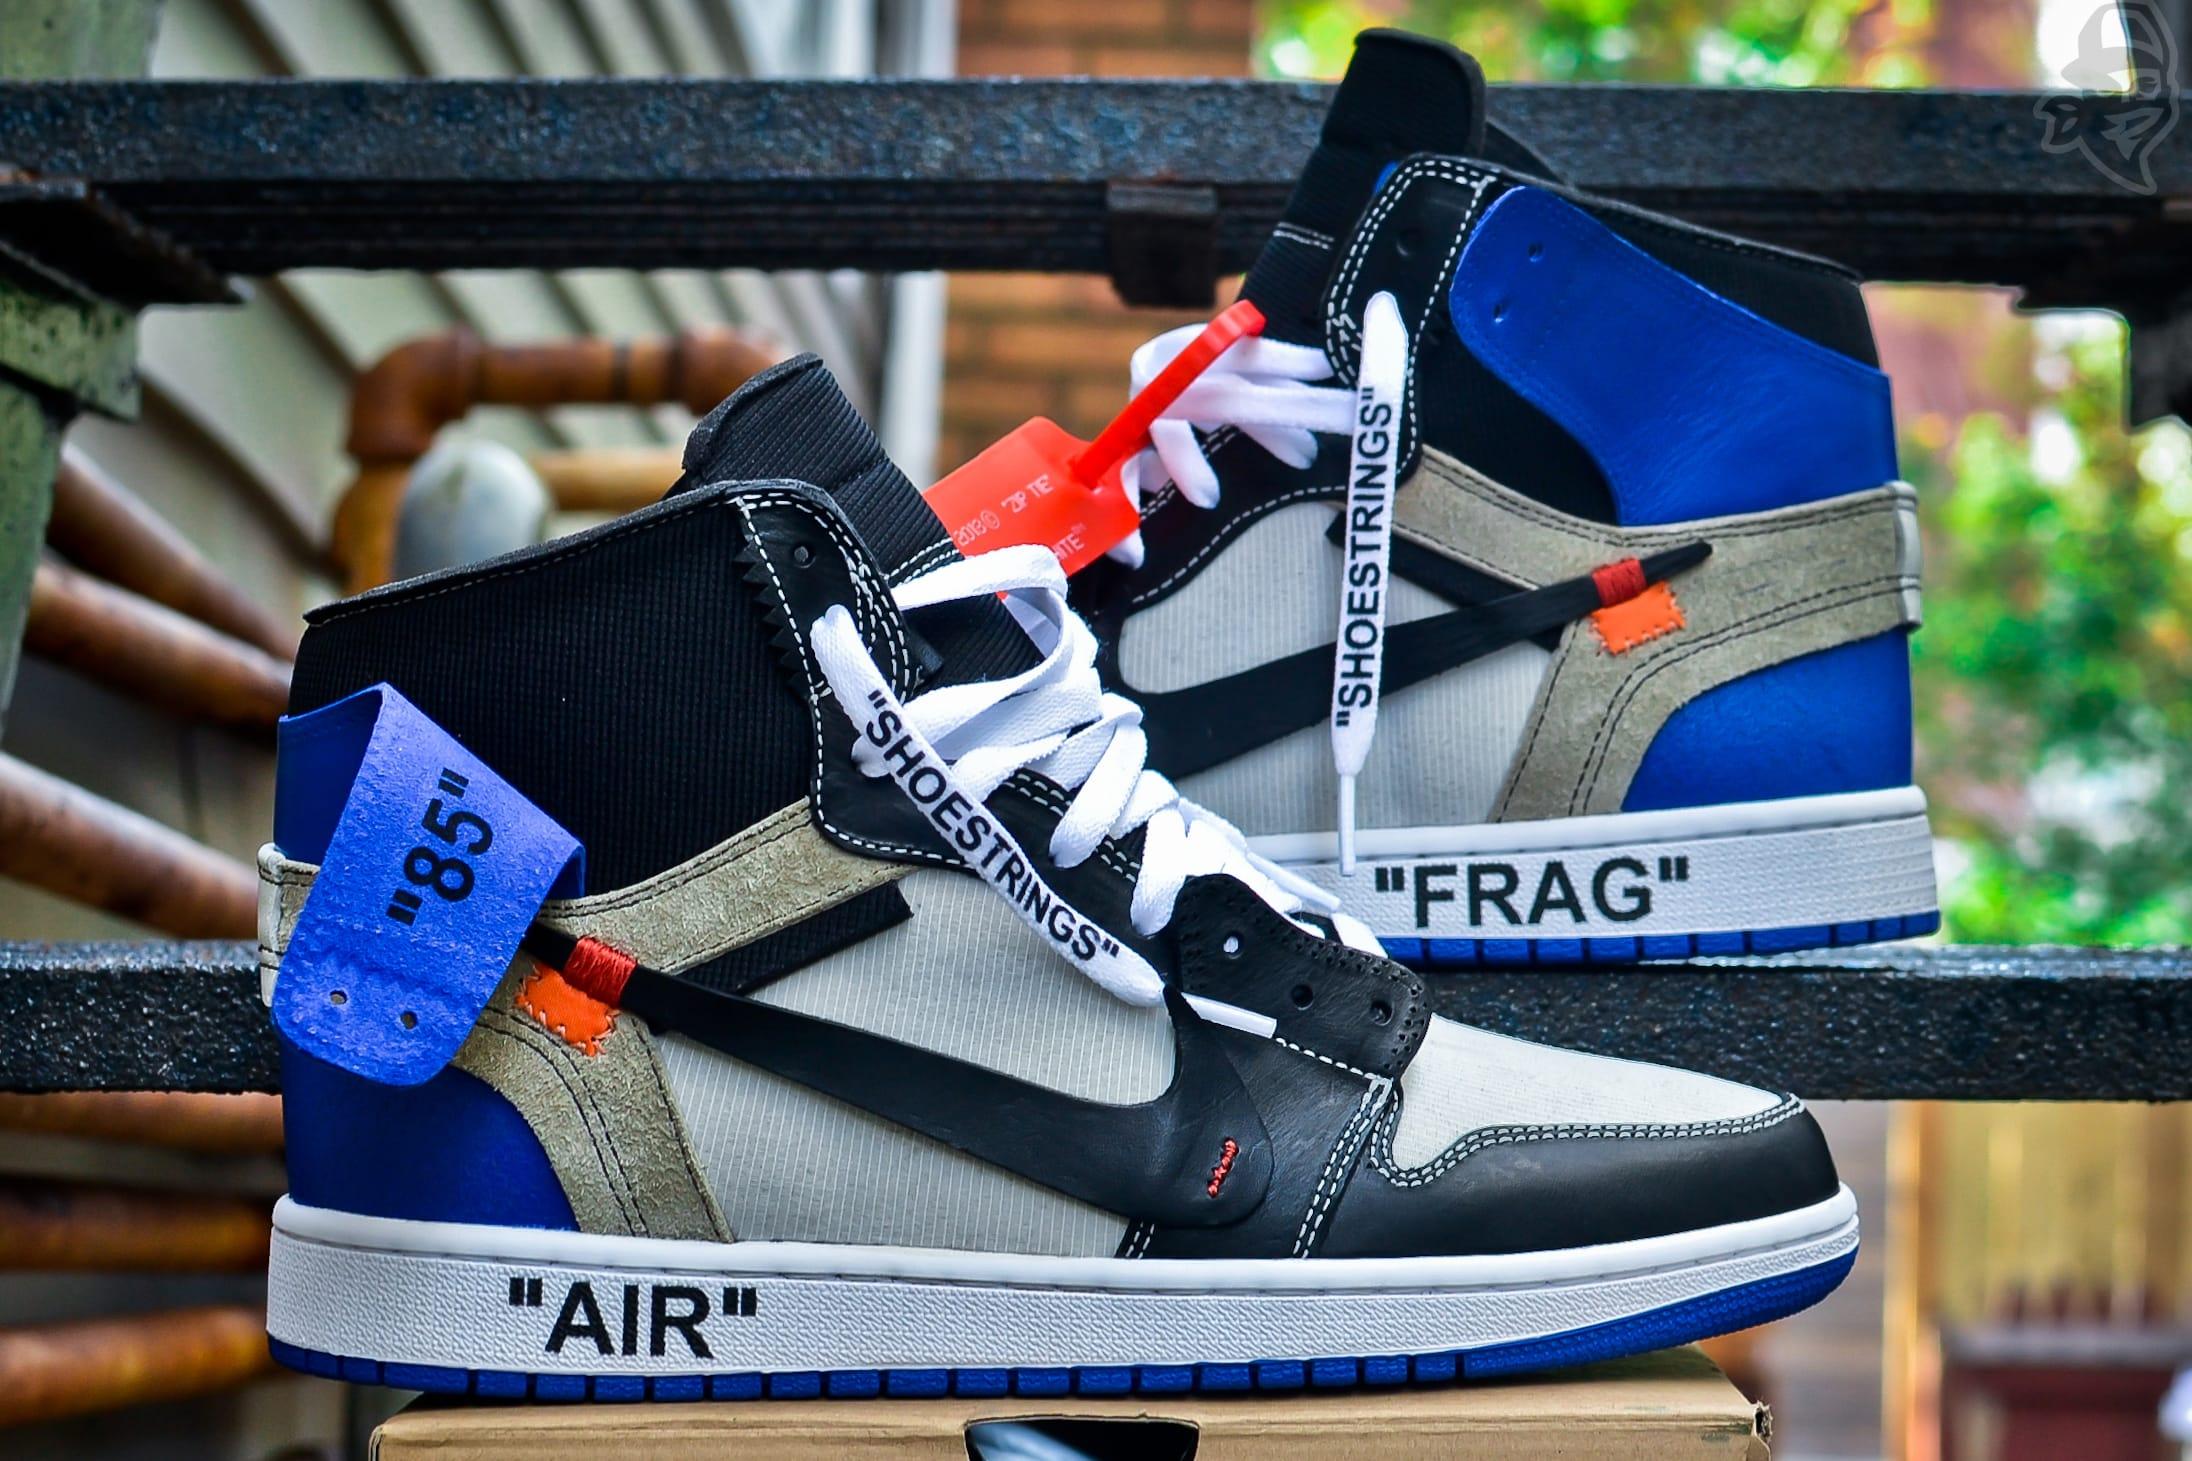 x fragment design Air Jordan 1 Custom